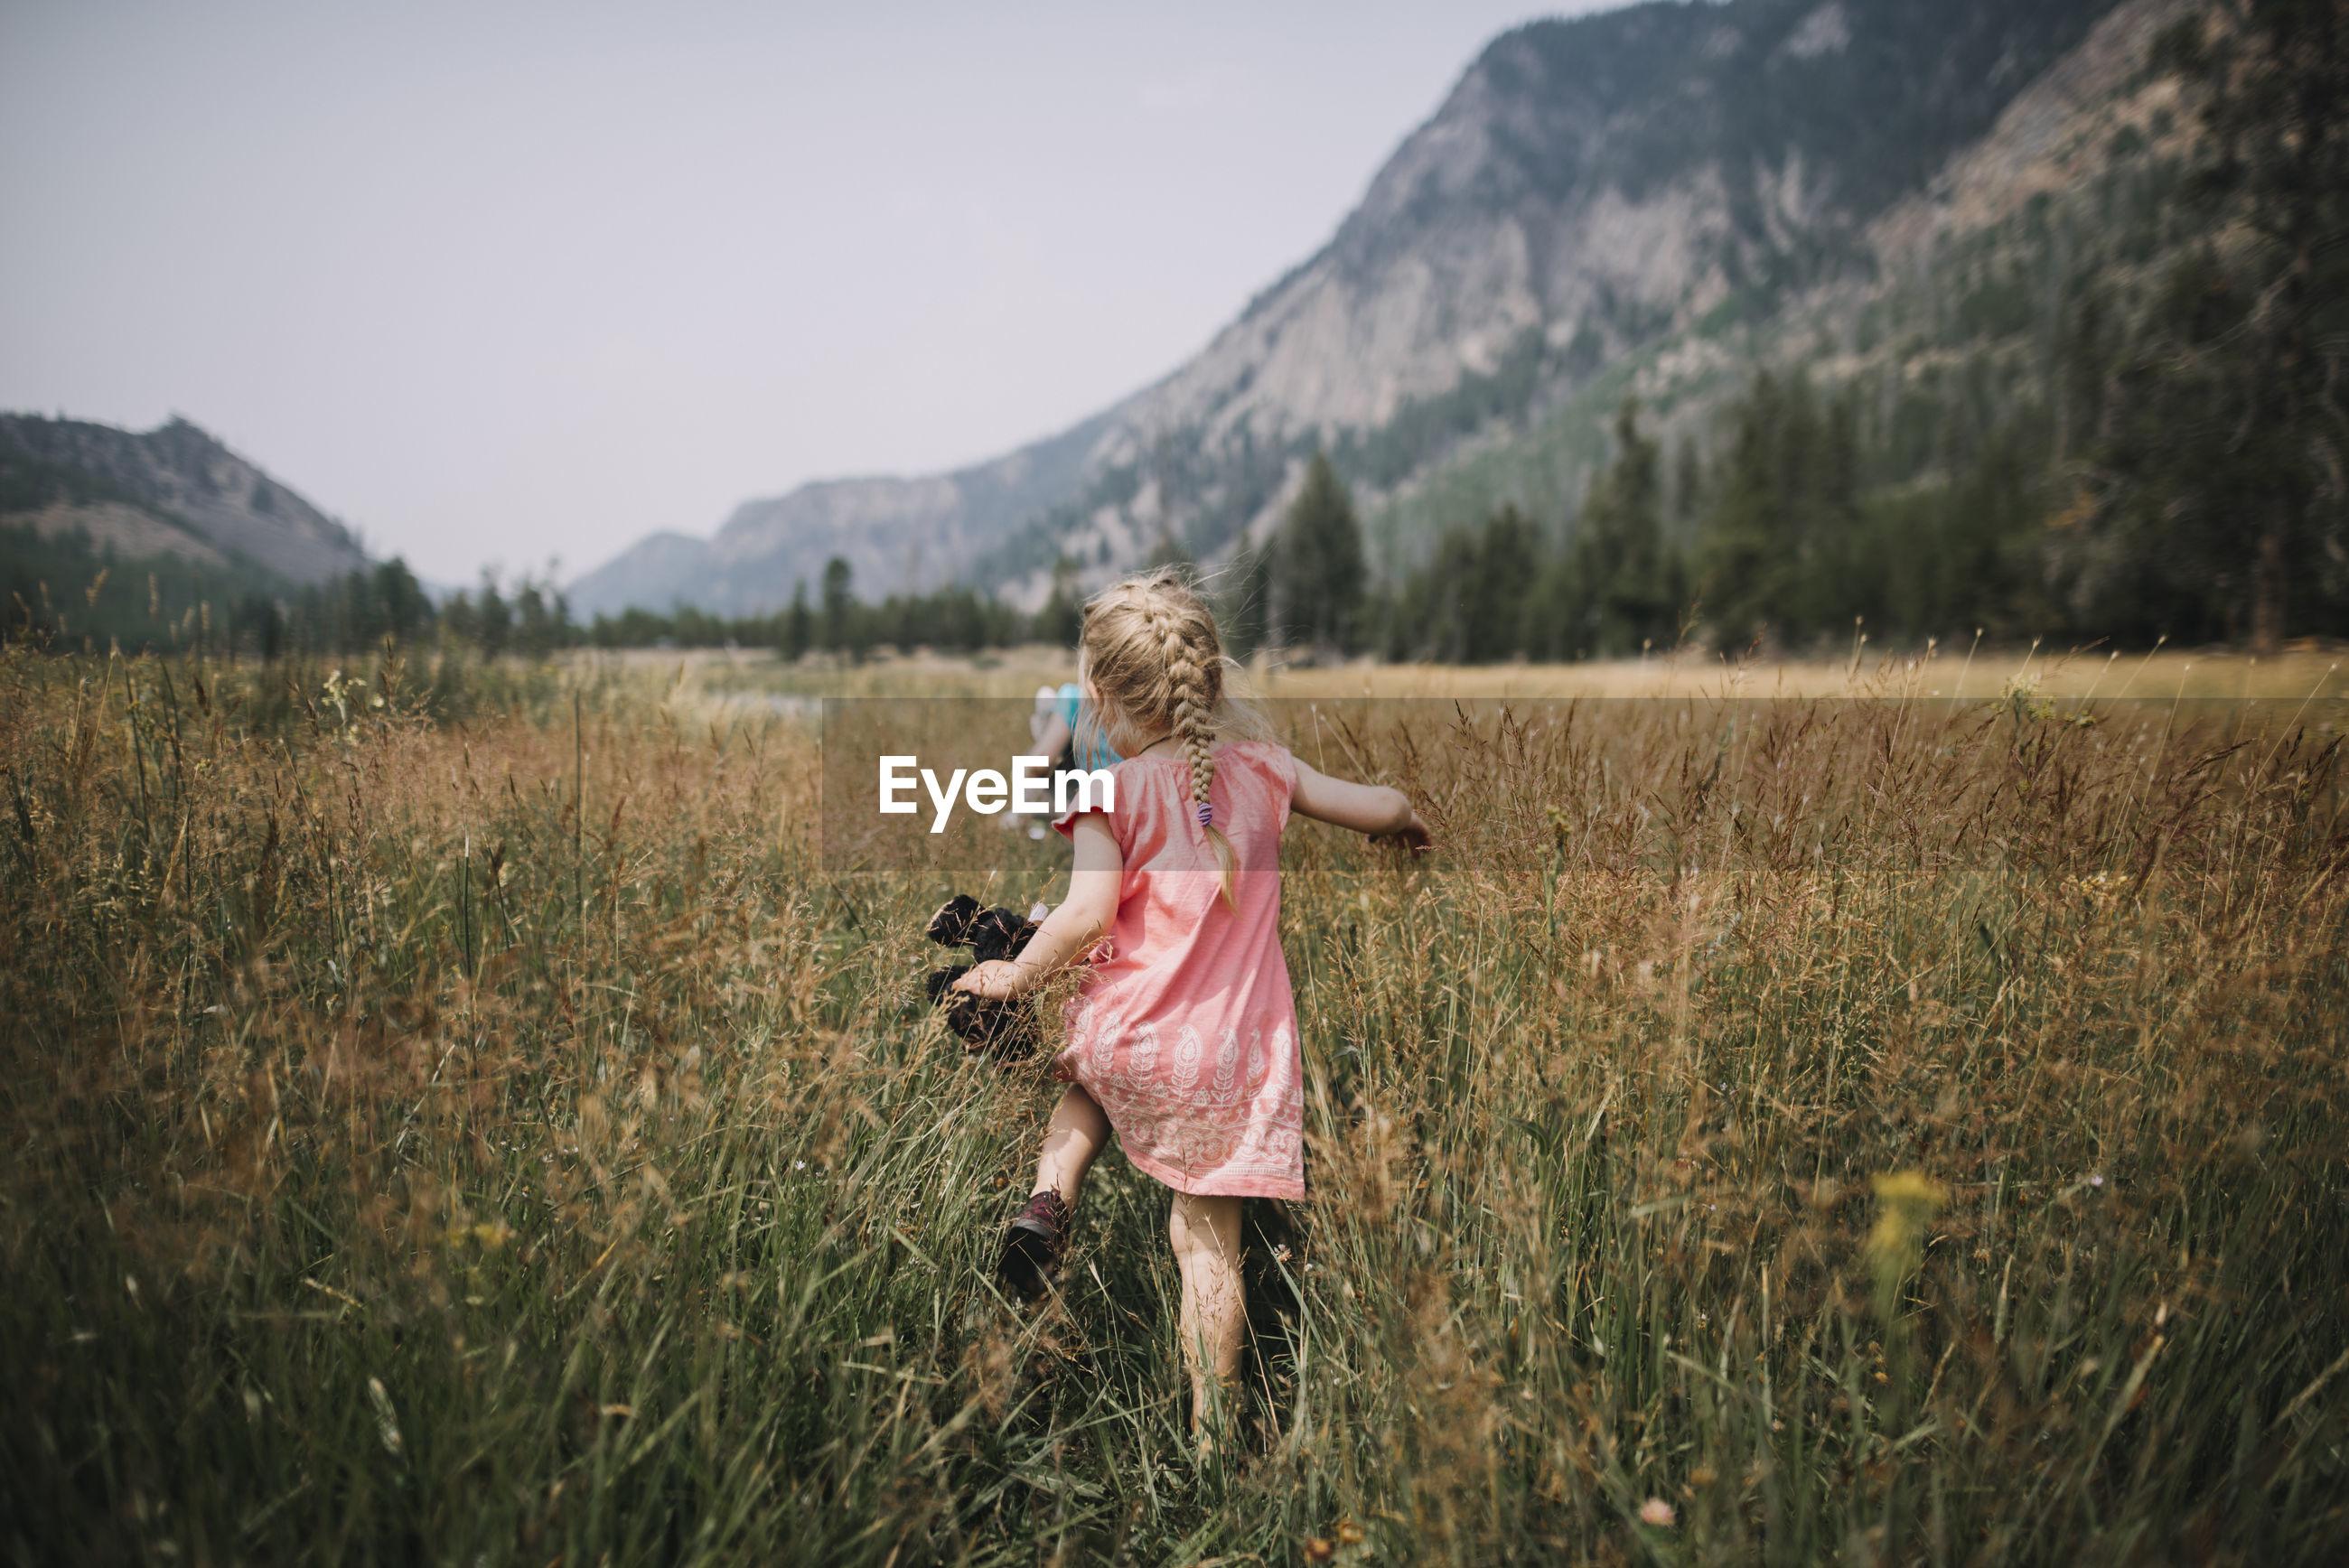 REAR VIEW OF WOMAN ON FIELD